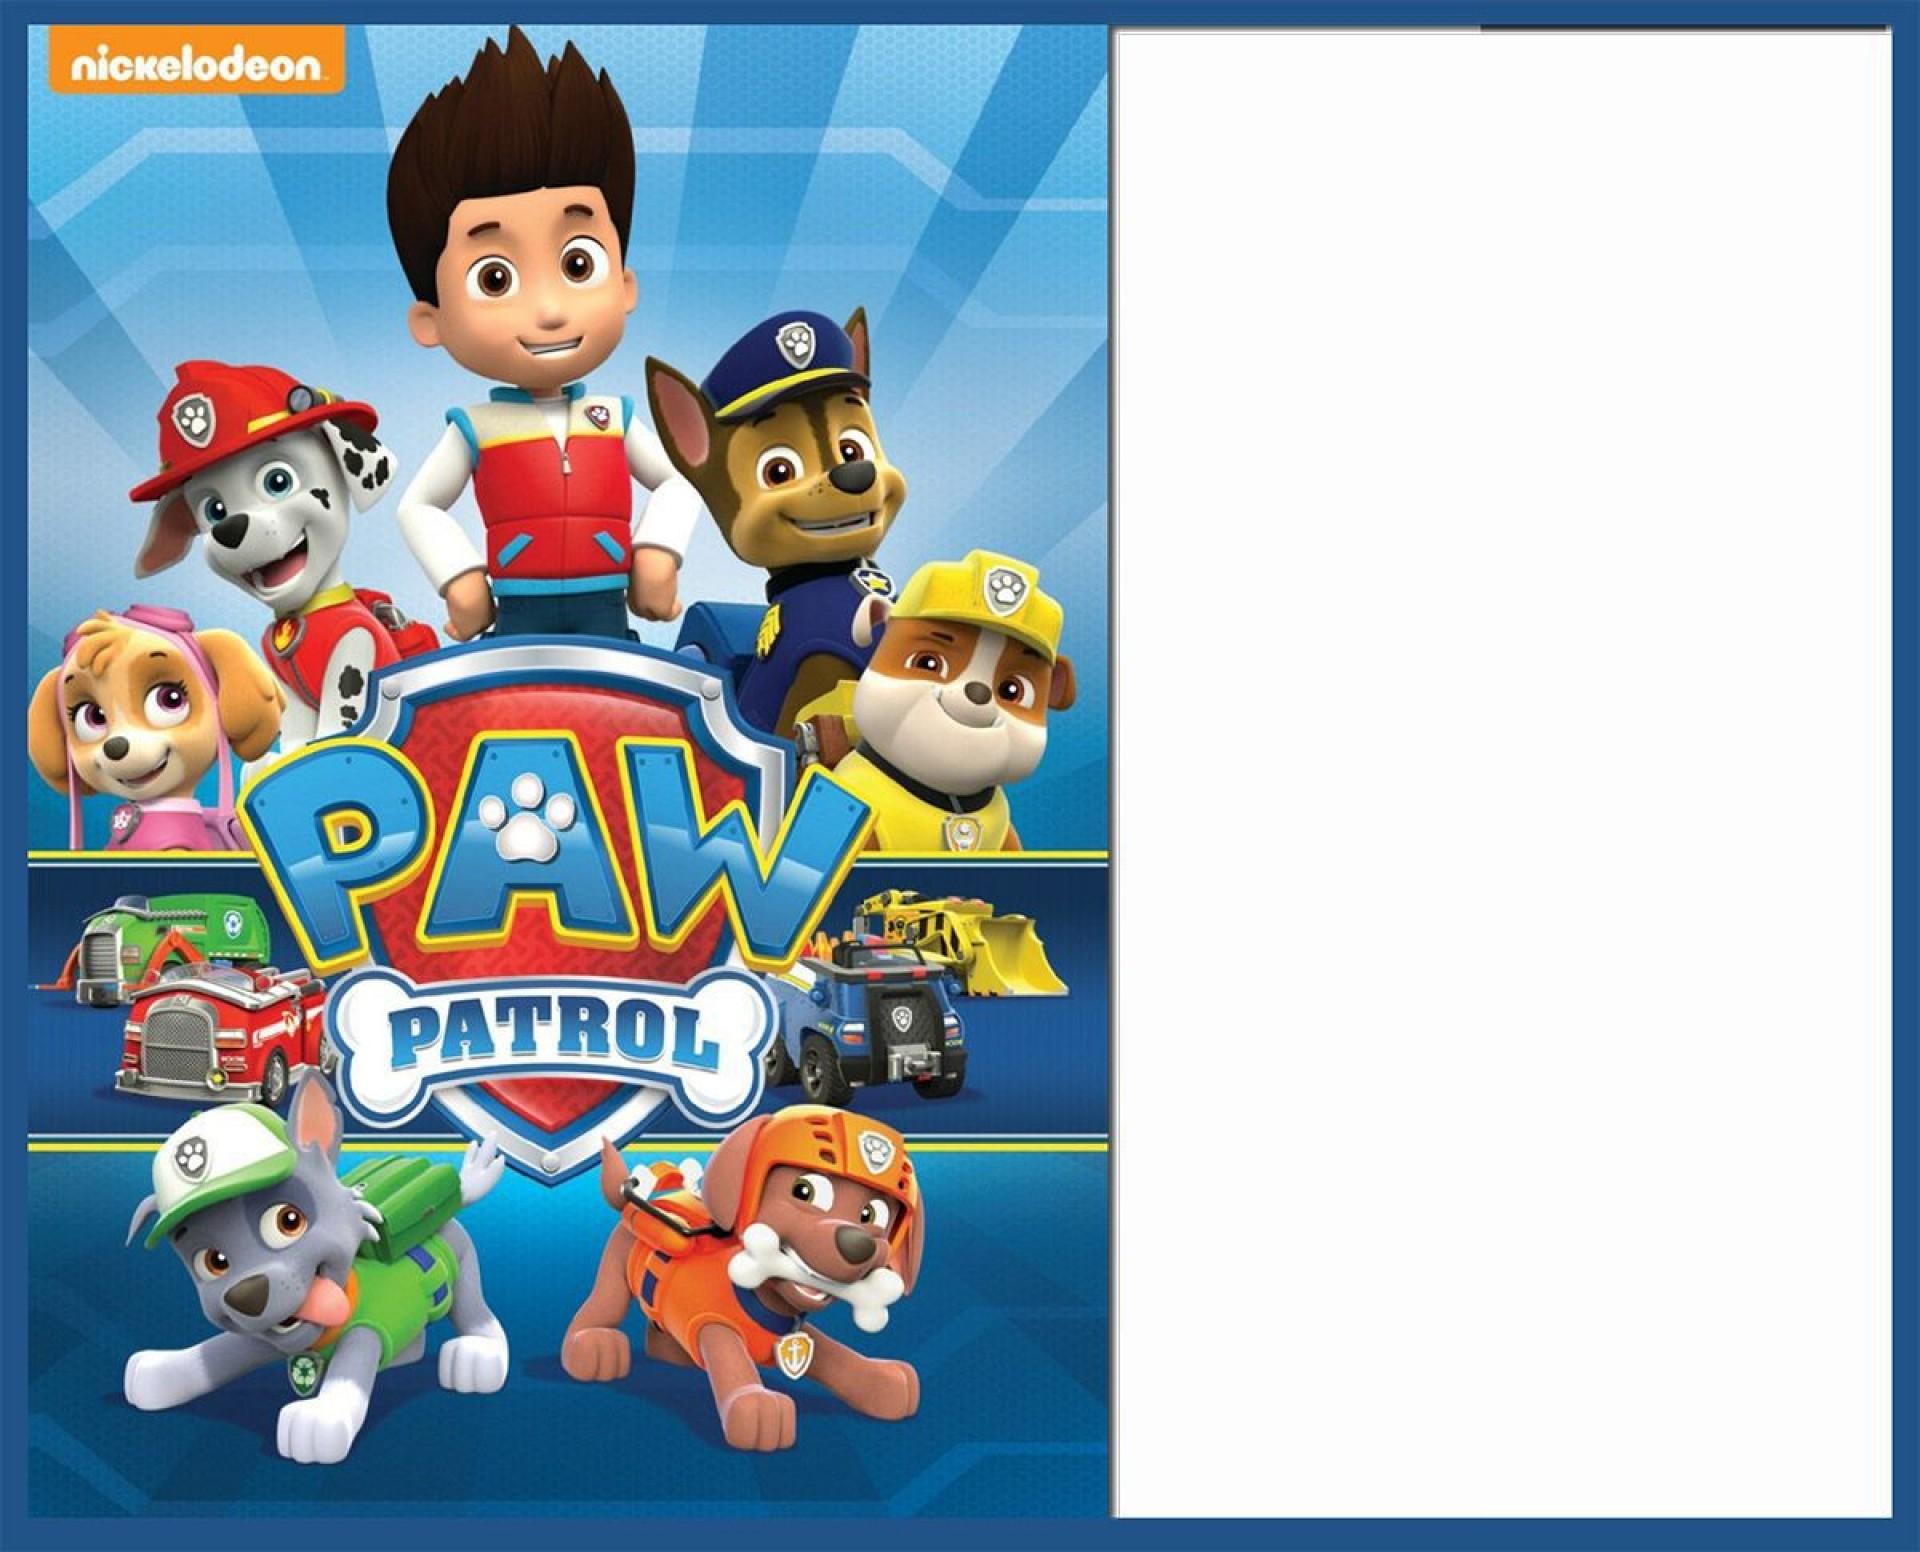 008 Rare Paw Patrol Birthday Invitation Template Concept  Party Invite Wording Skye Free1920